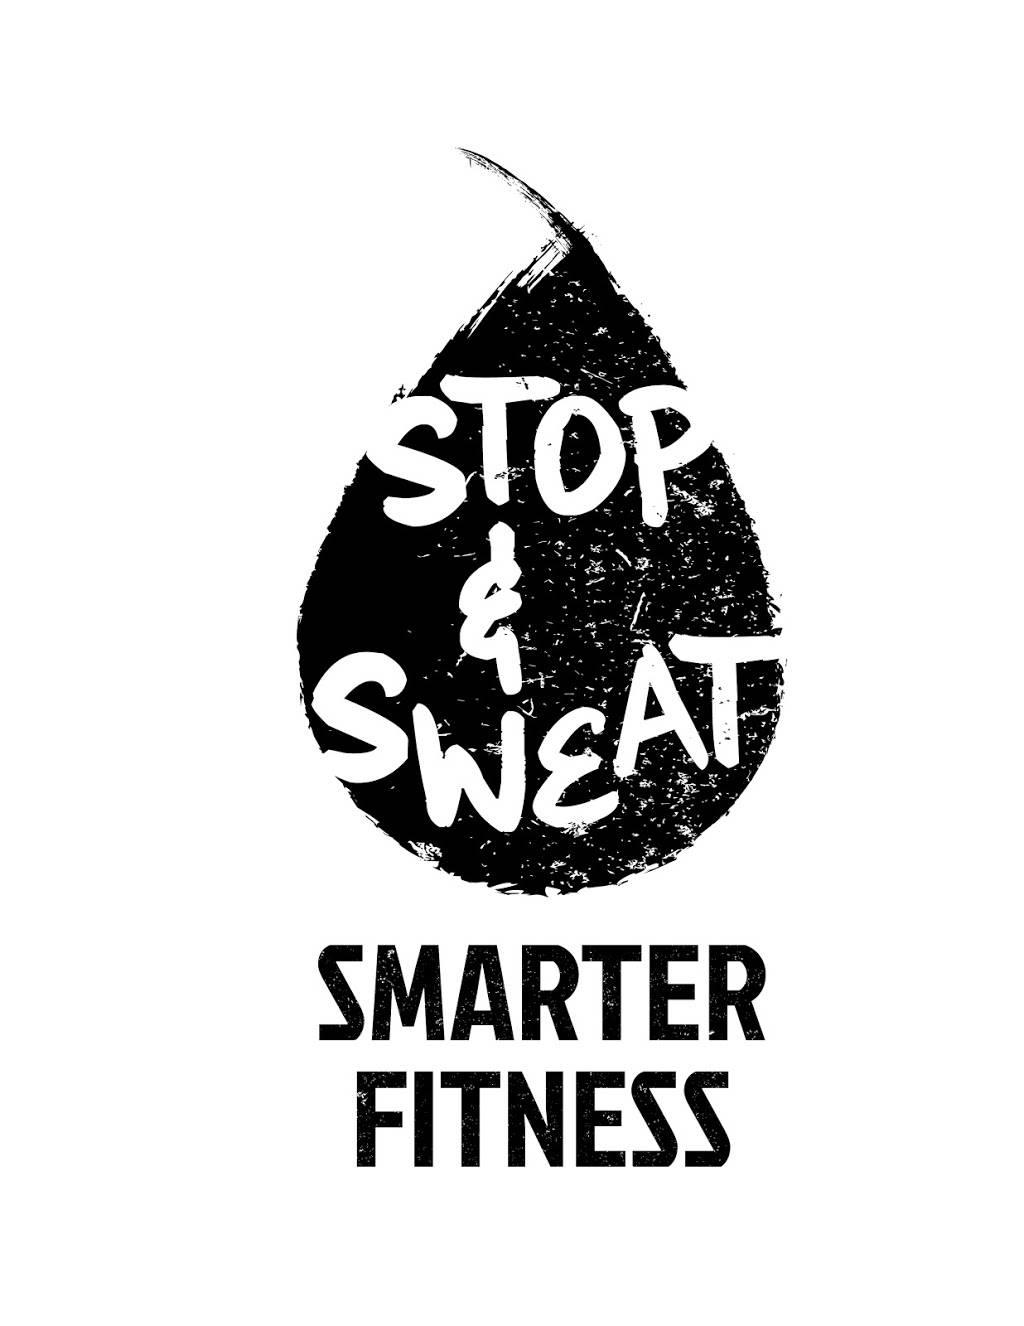 Stop & Sweat Smarter Fitness LLC - gym  | Photo 6 of 7 | Address: 2777 Race Track Rd, Fruit Cove, FL 32259, USA | Phone: (785) 766-5283